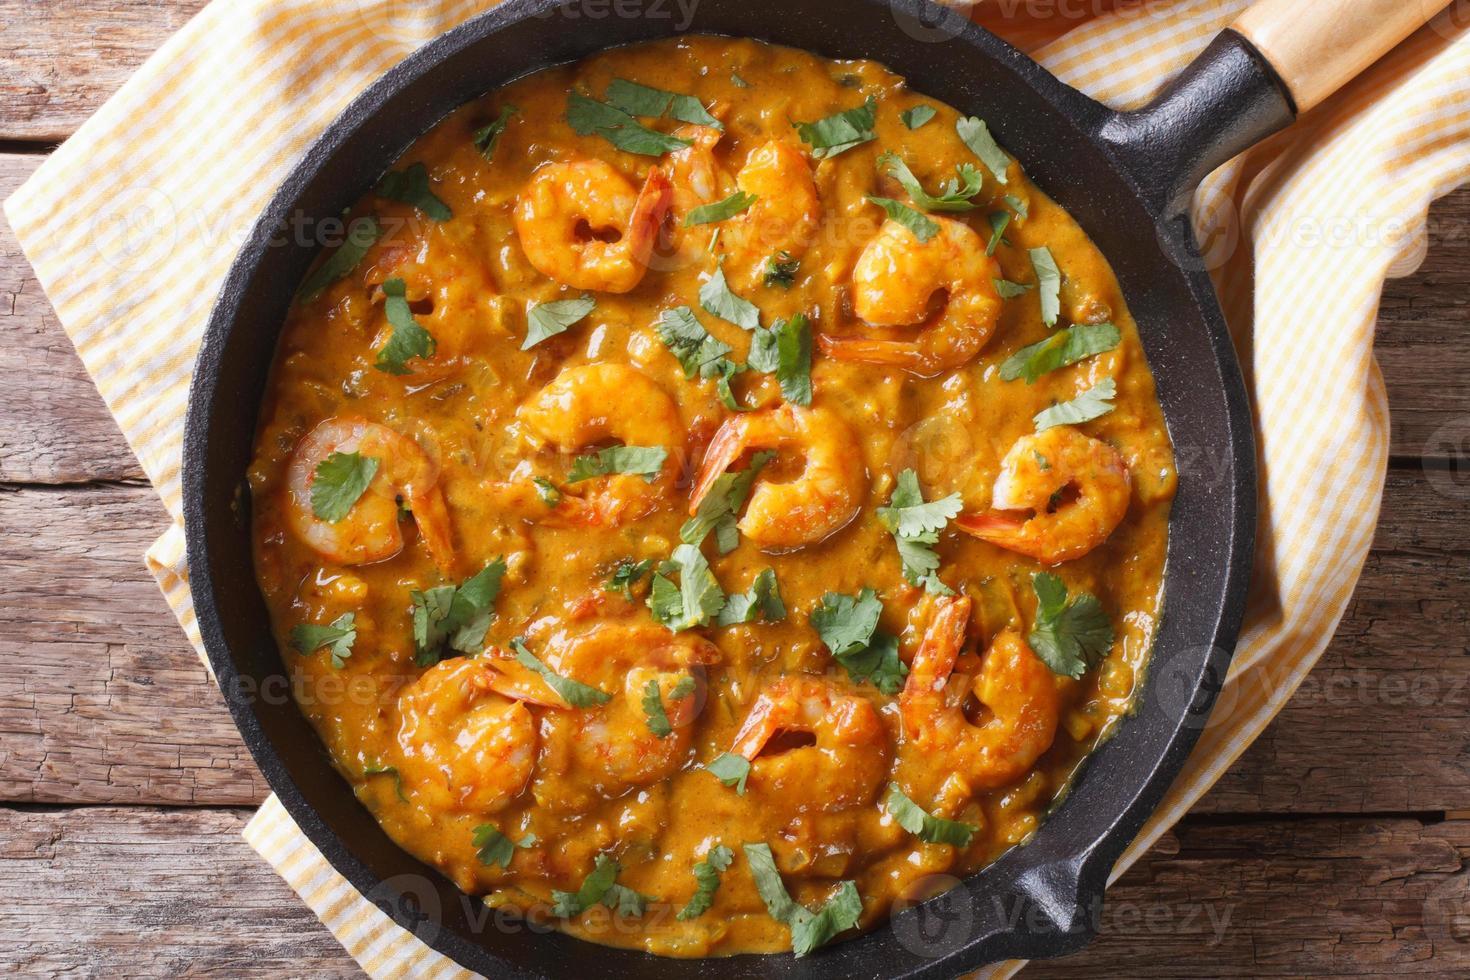 räkor i currysås i pannan närbild horisontell toppvy foto